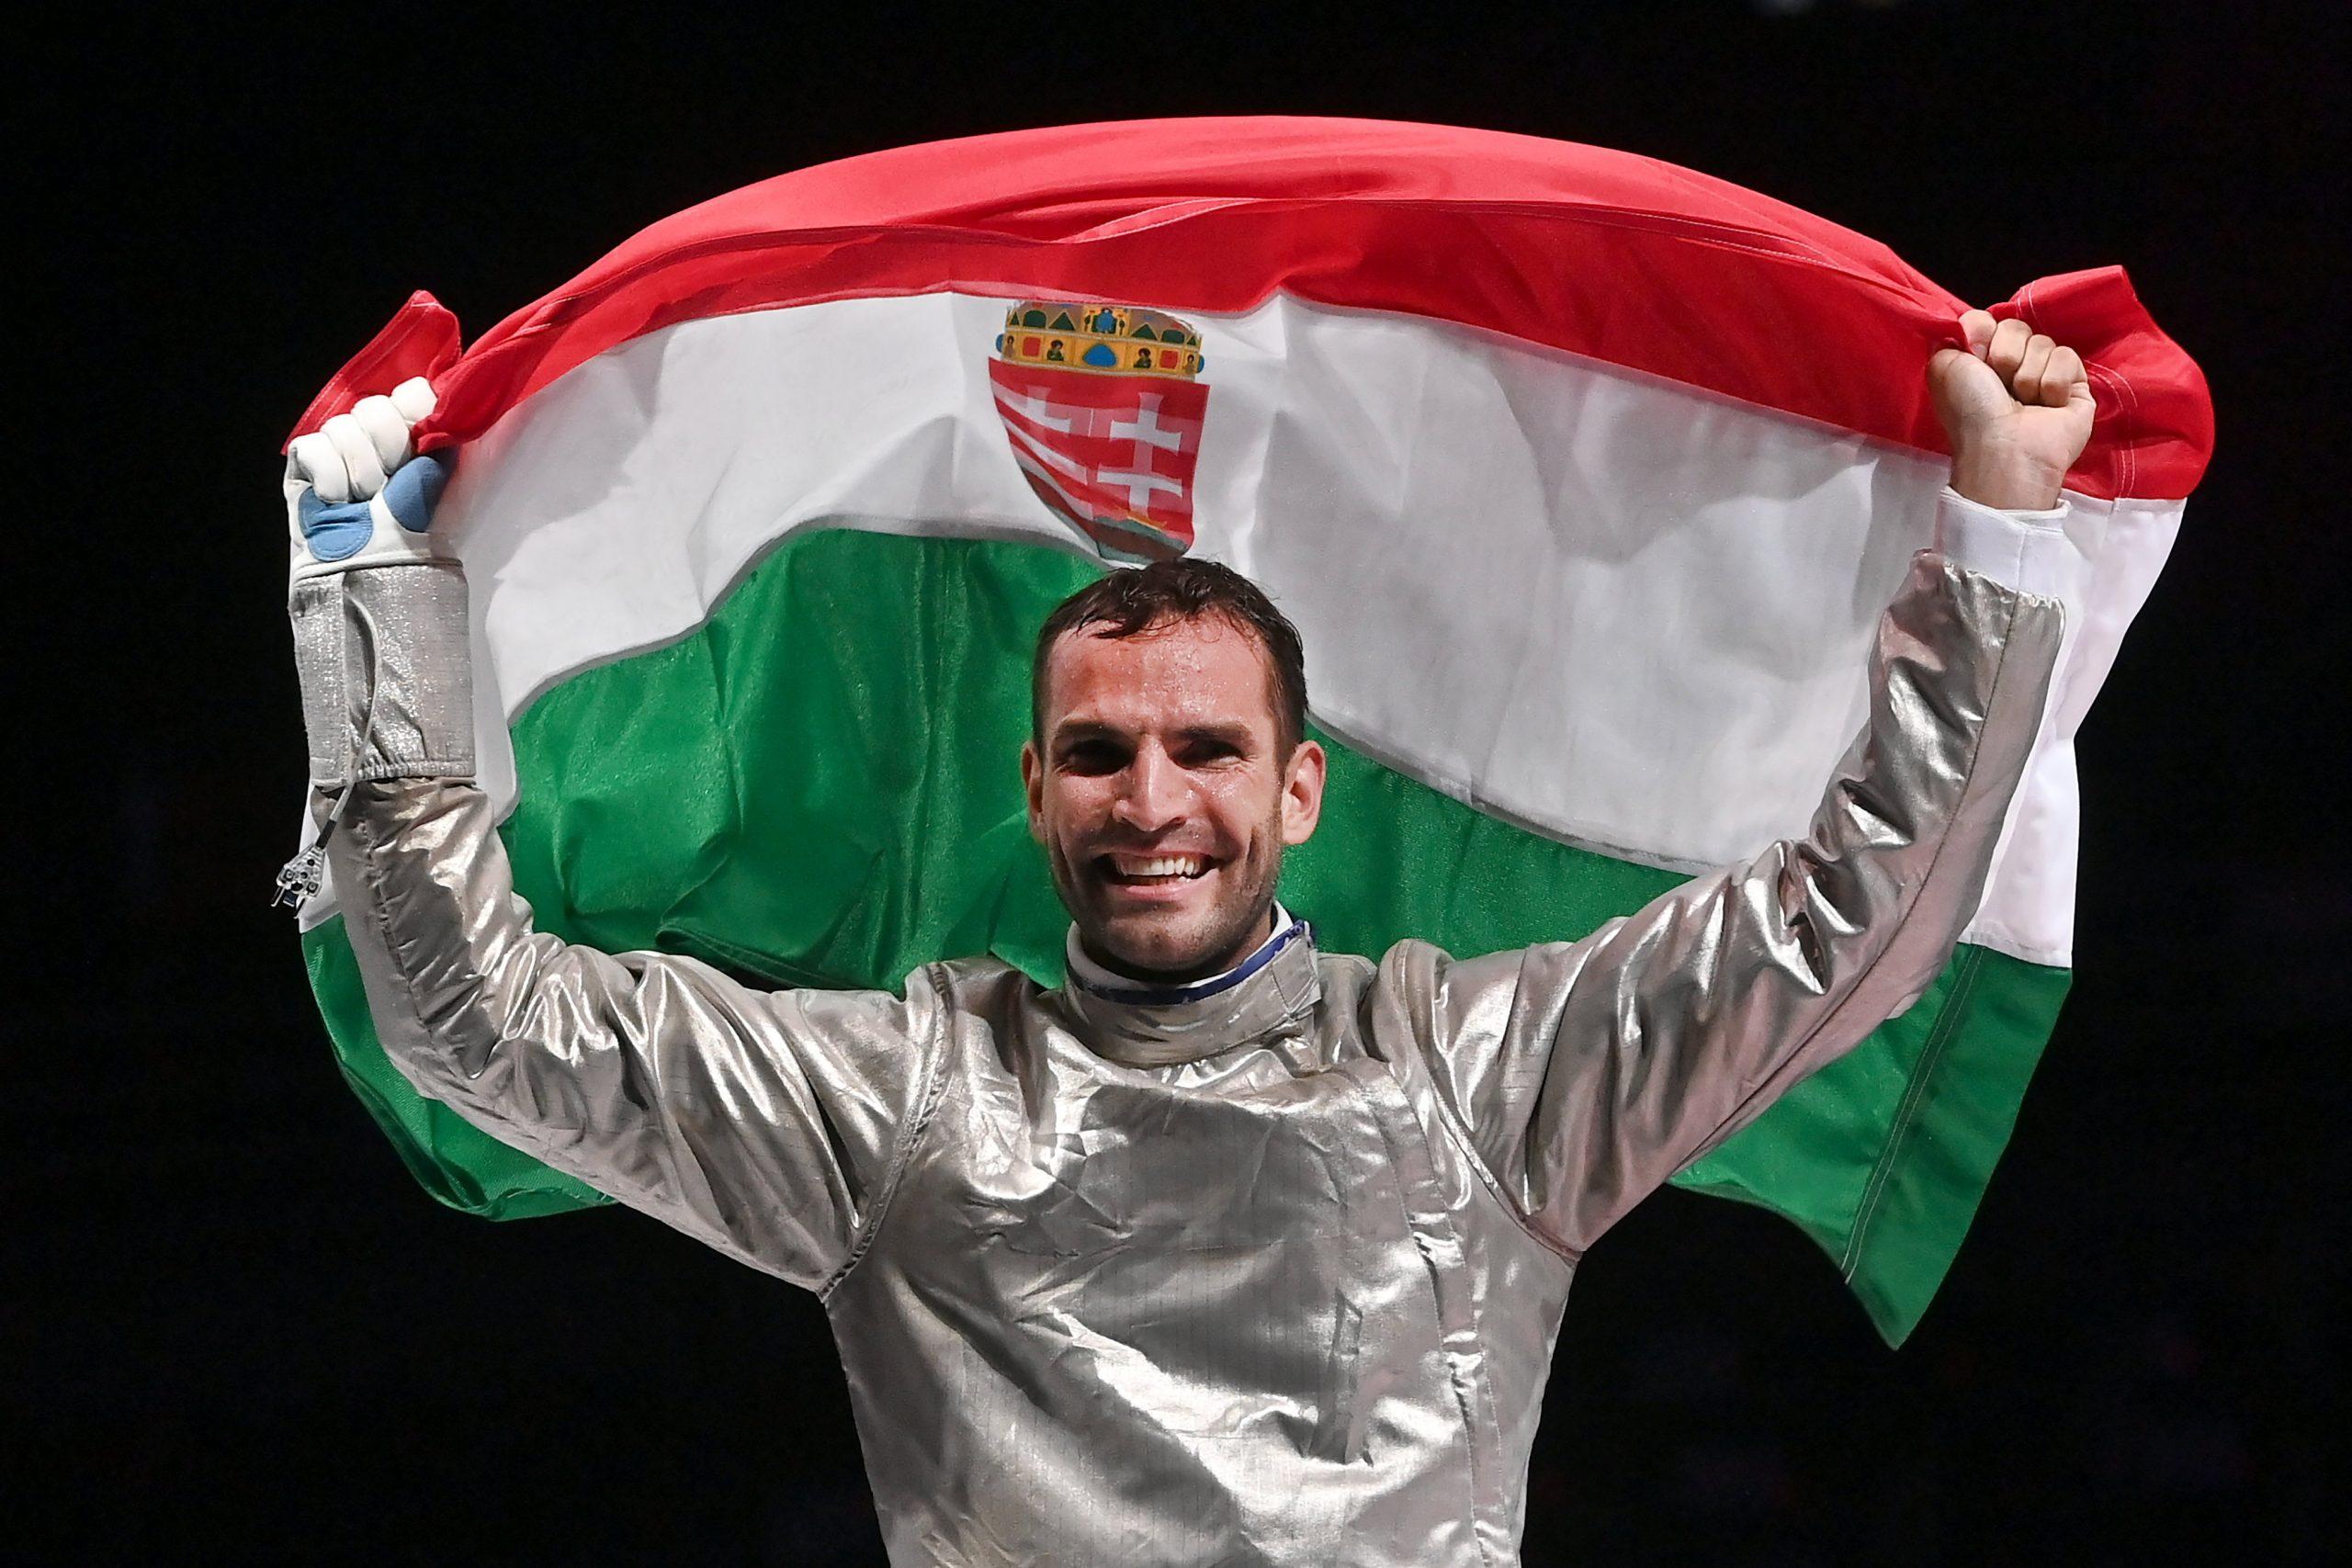 Áron Szilágyi zum dritten Mal in Folge Olympiasieger!